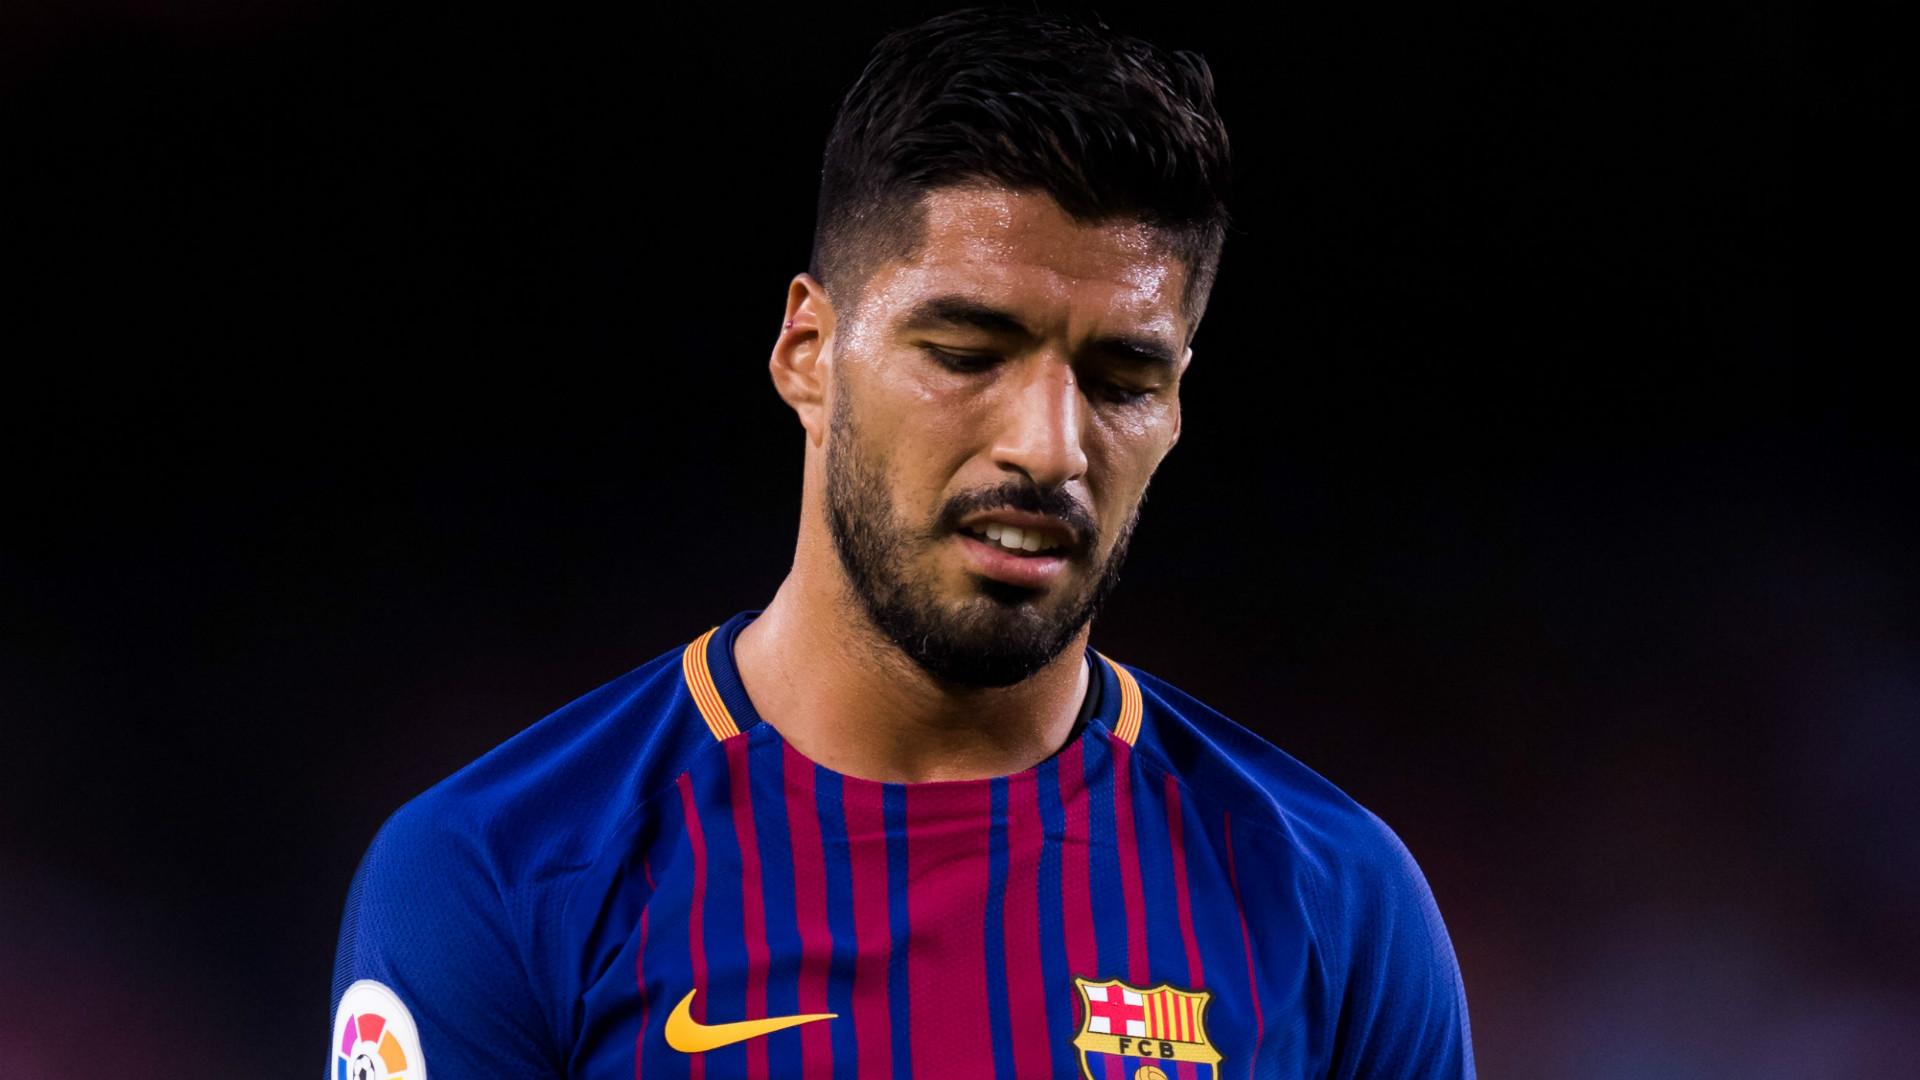 Luis Suárez firma su peor arranque de temporada en Europa. Goal.com